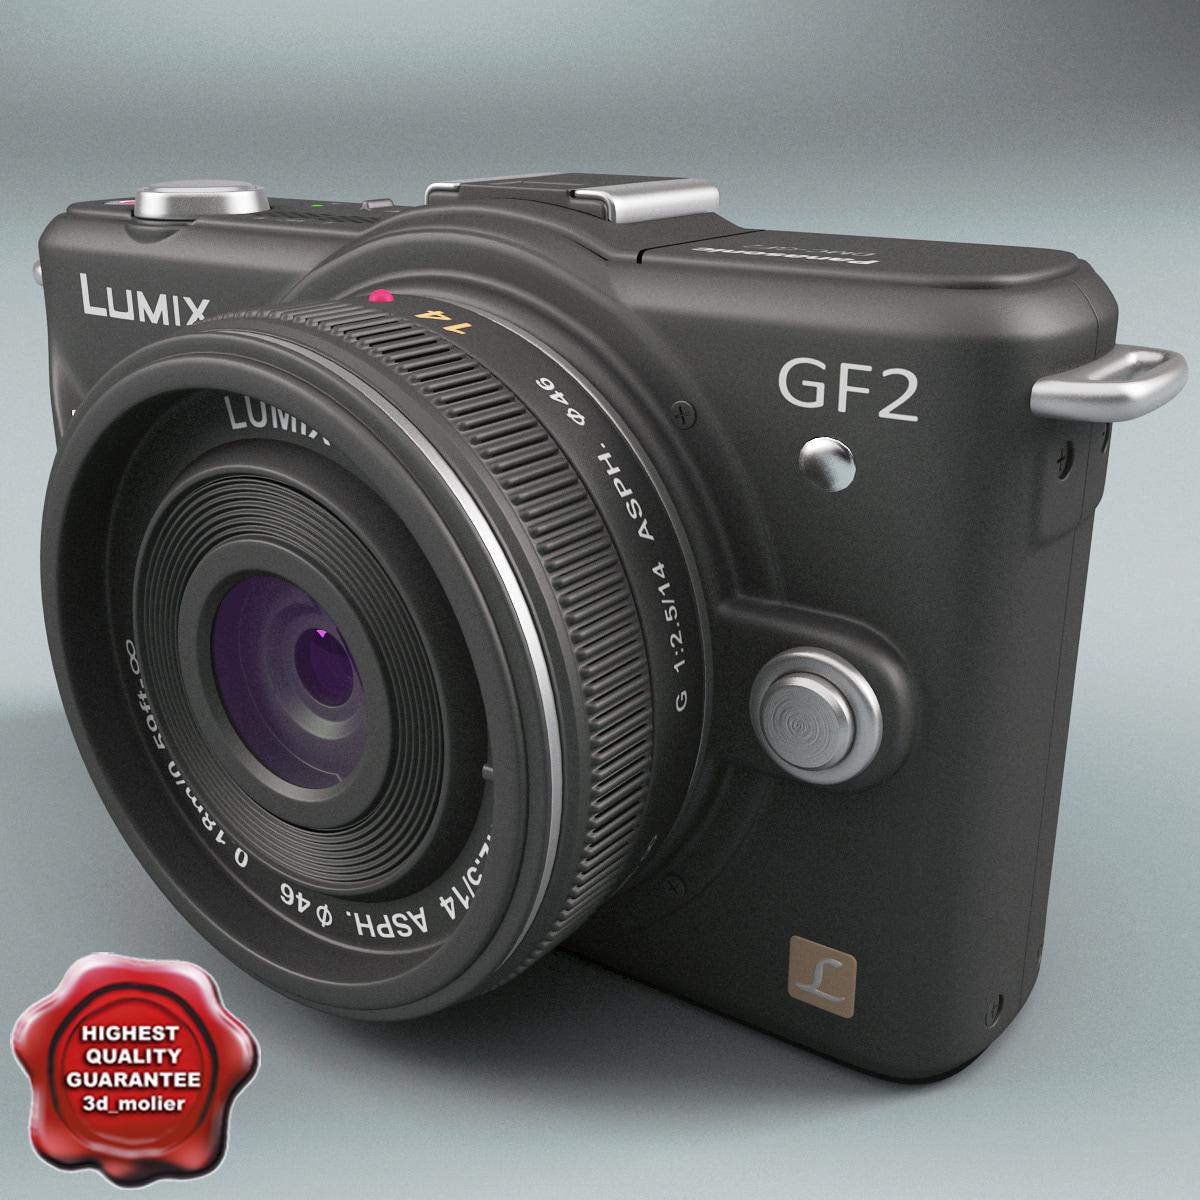 Panasonic_Lumix_DMC-GF2_00.jpg